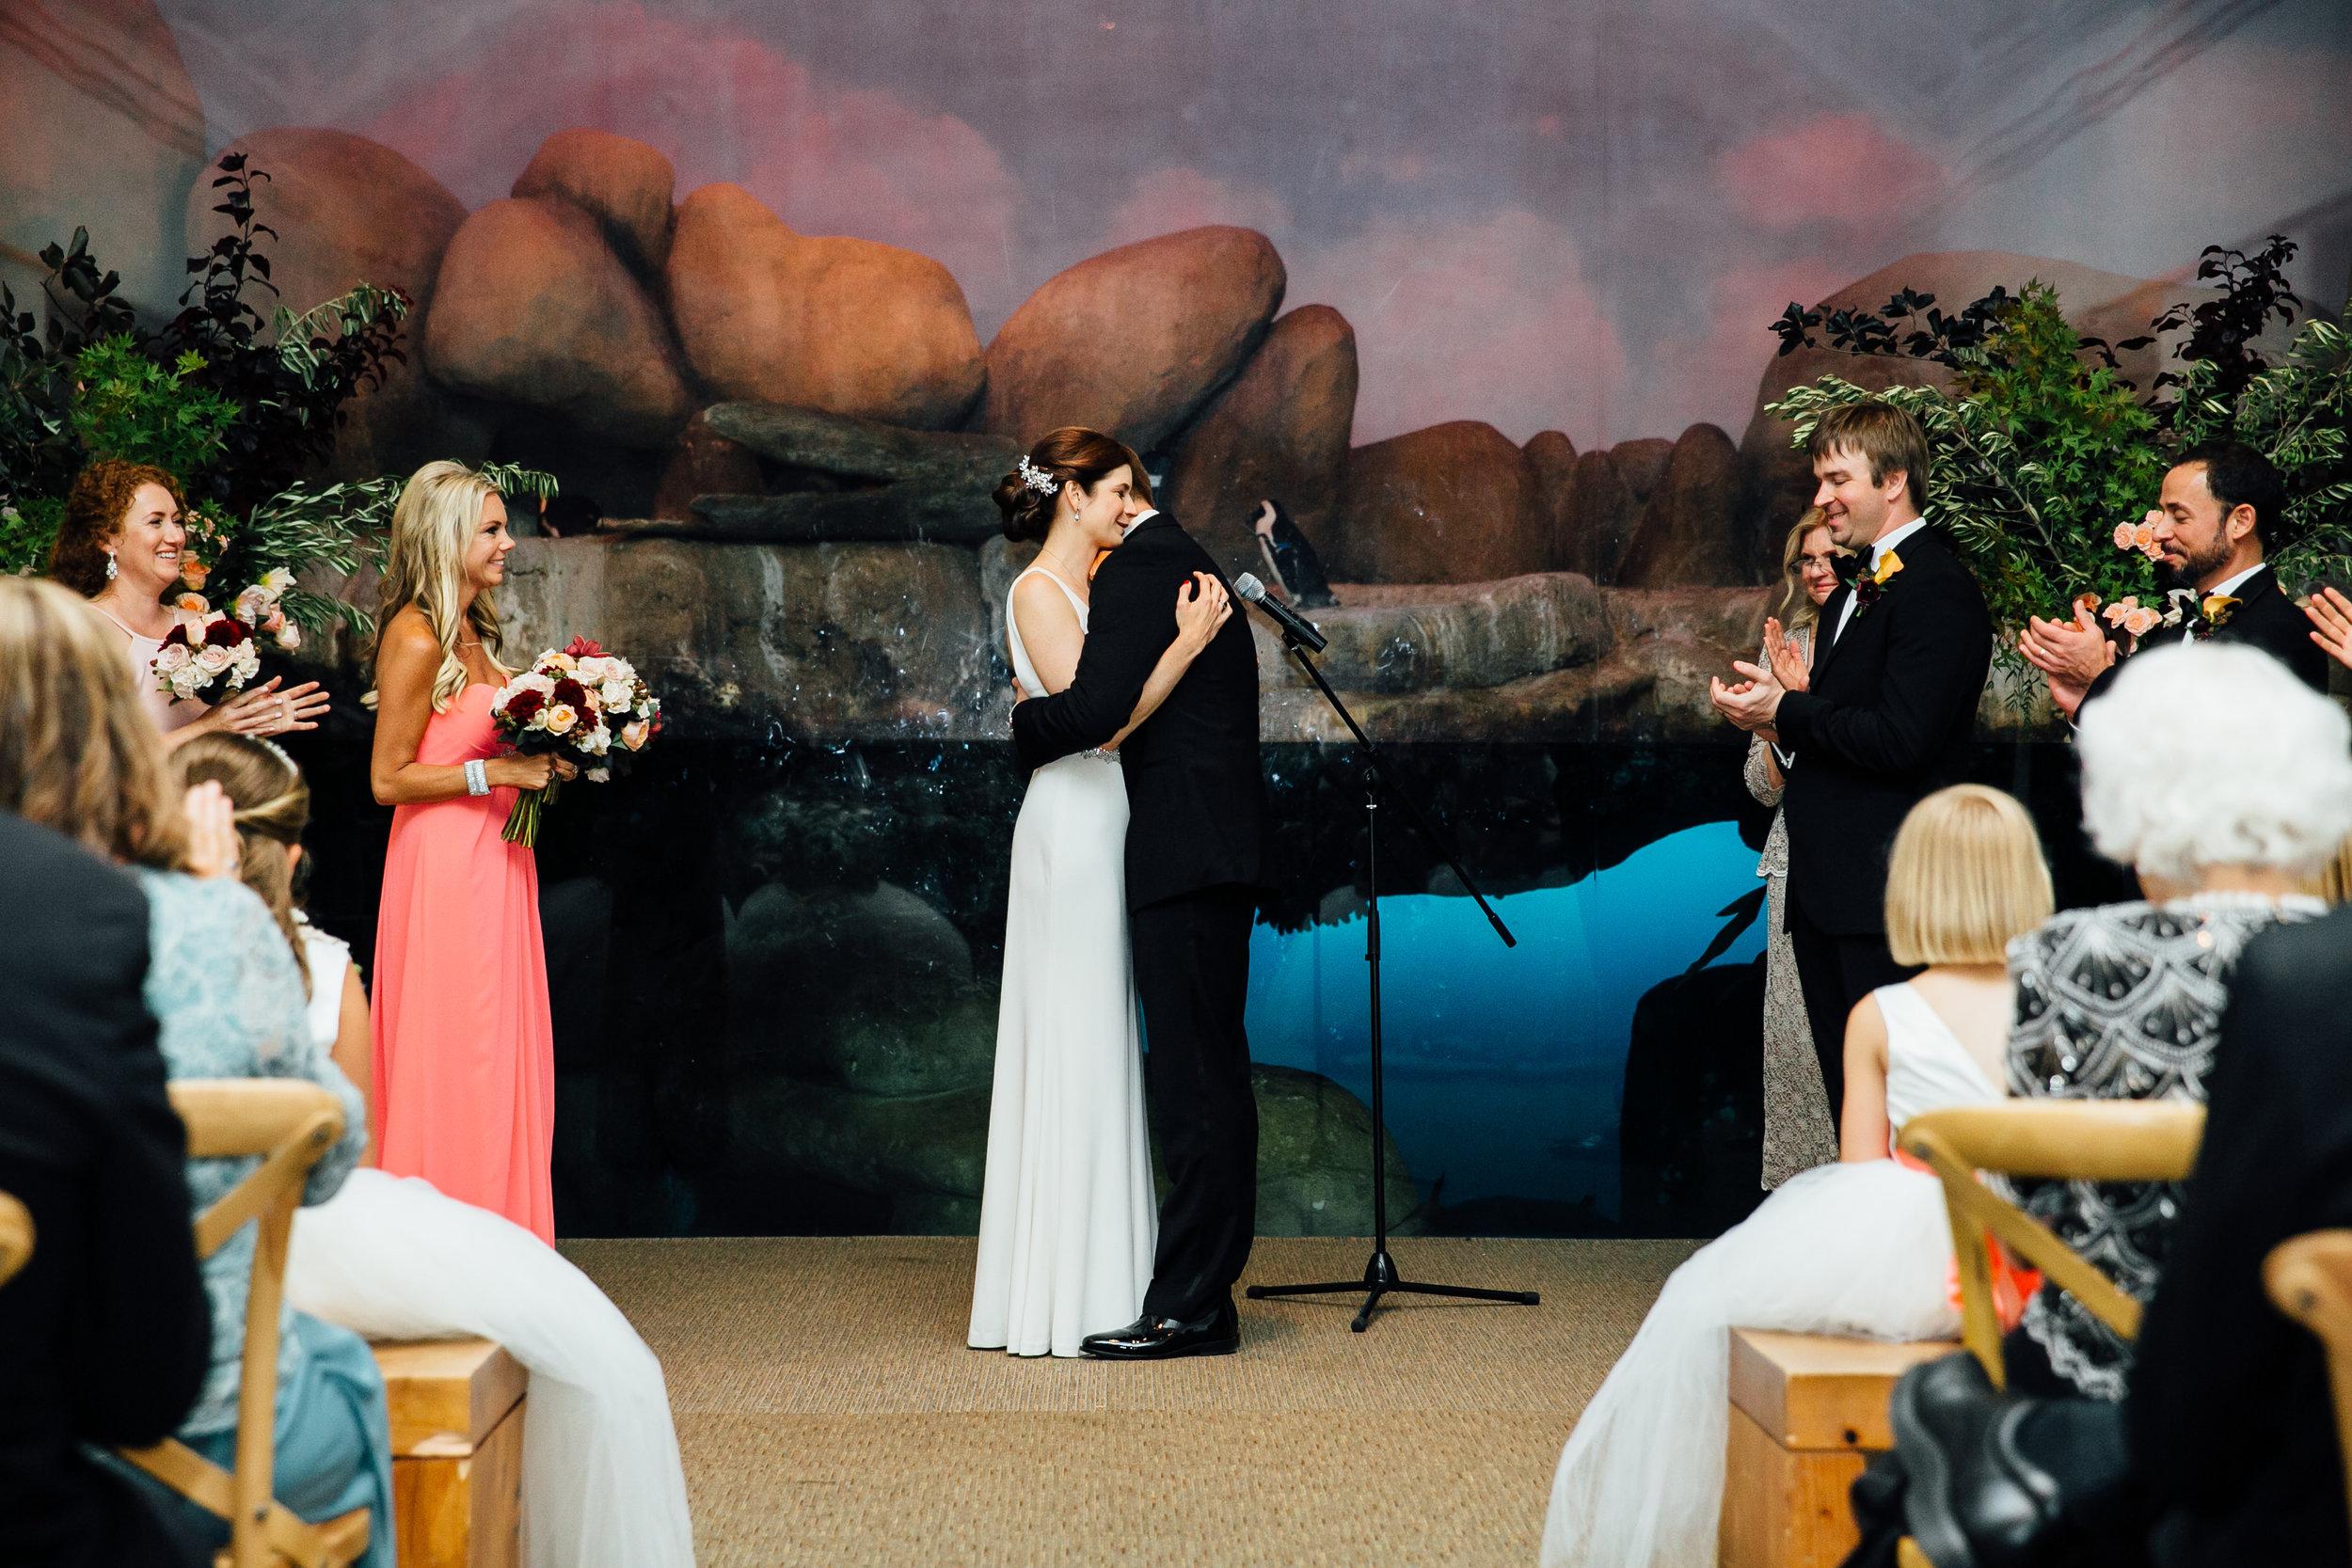 Wedding_KathleenMichael_Ceremony-207.jpg